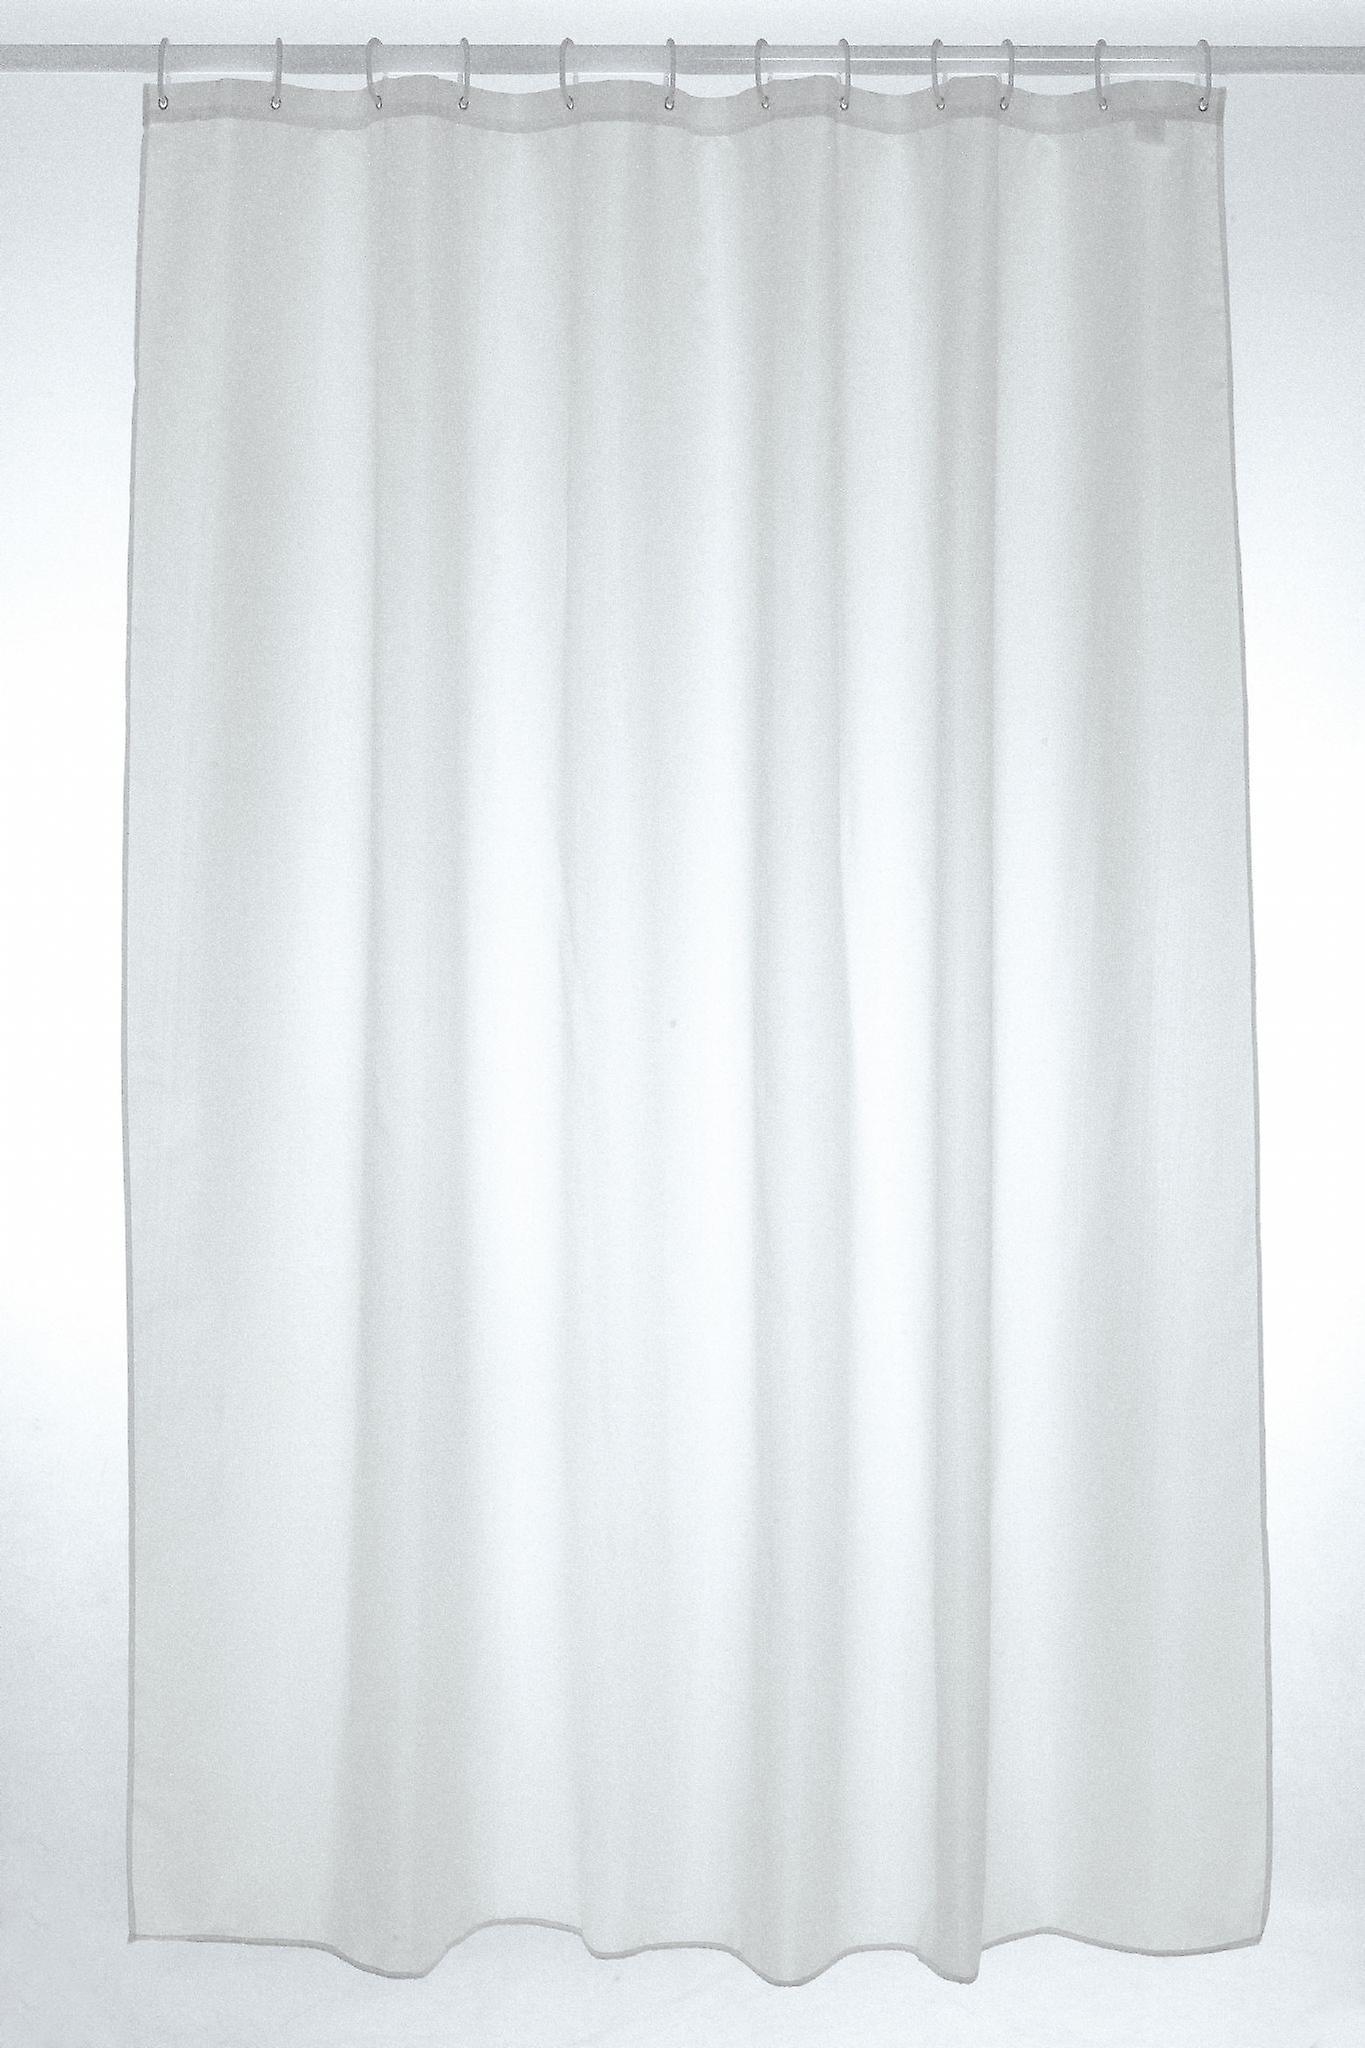 Cortina de ducha del poliester blanco llano 180 x 220cm